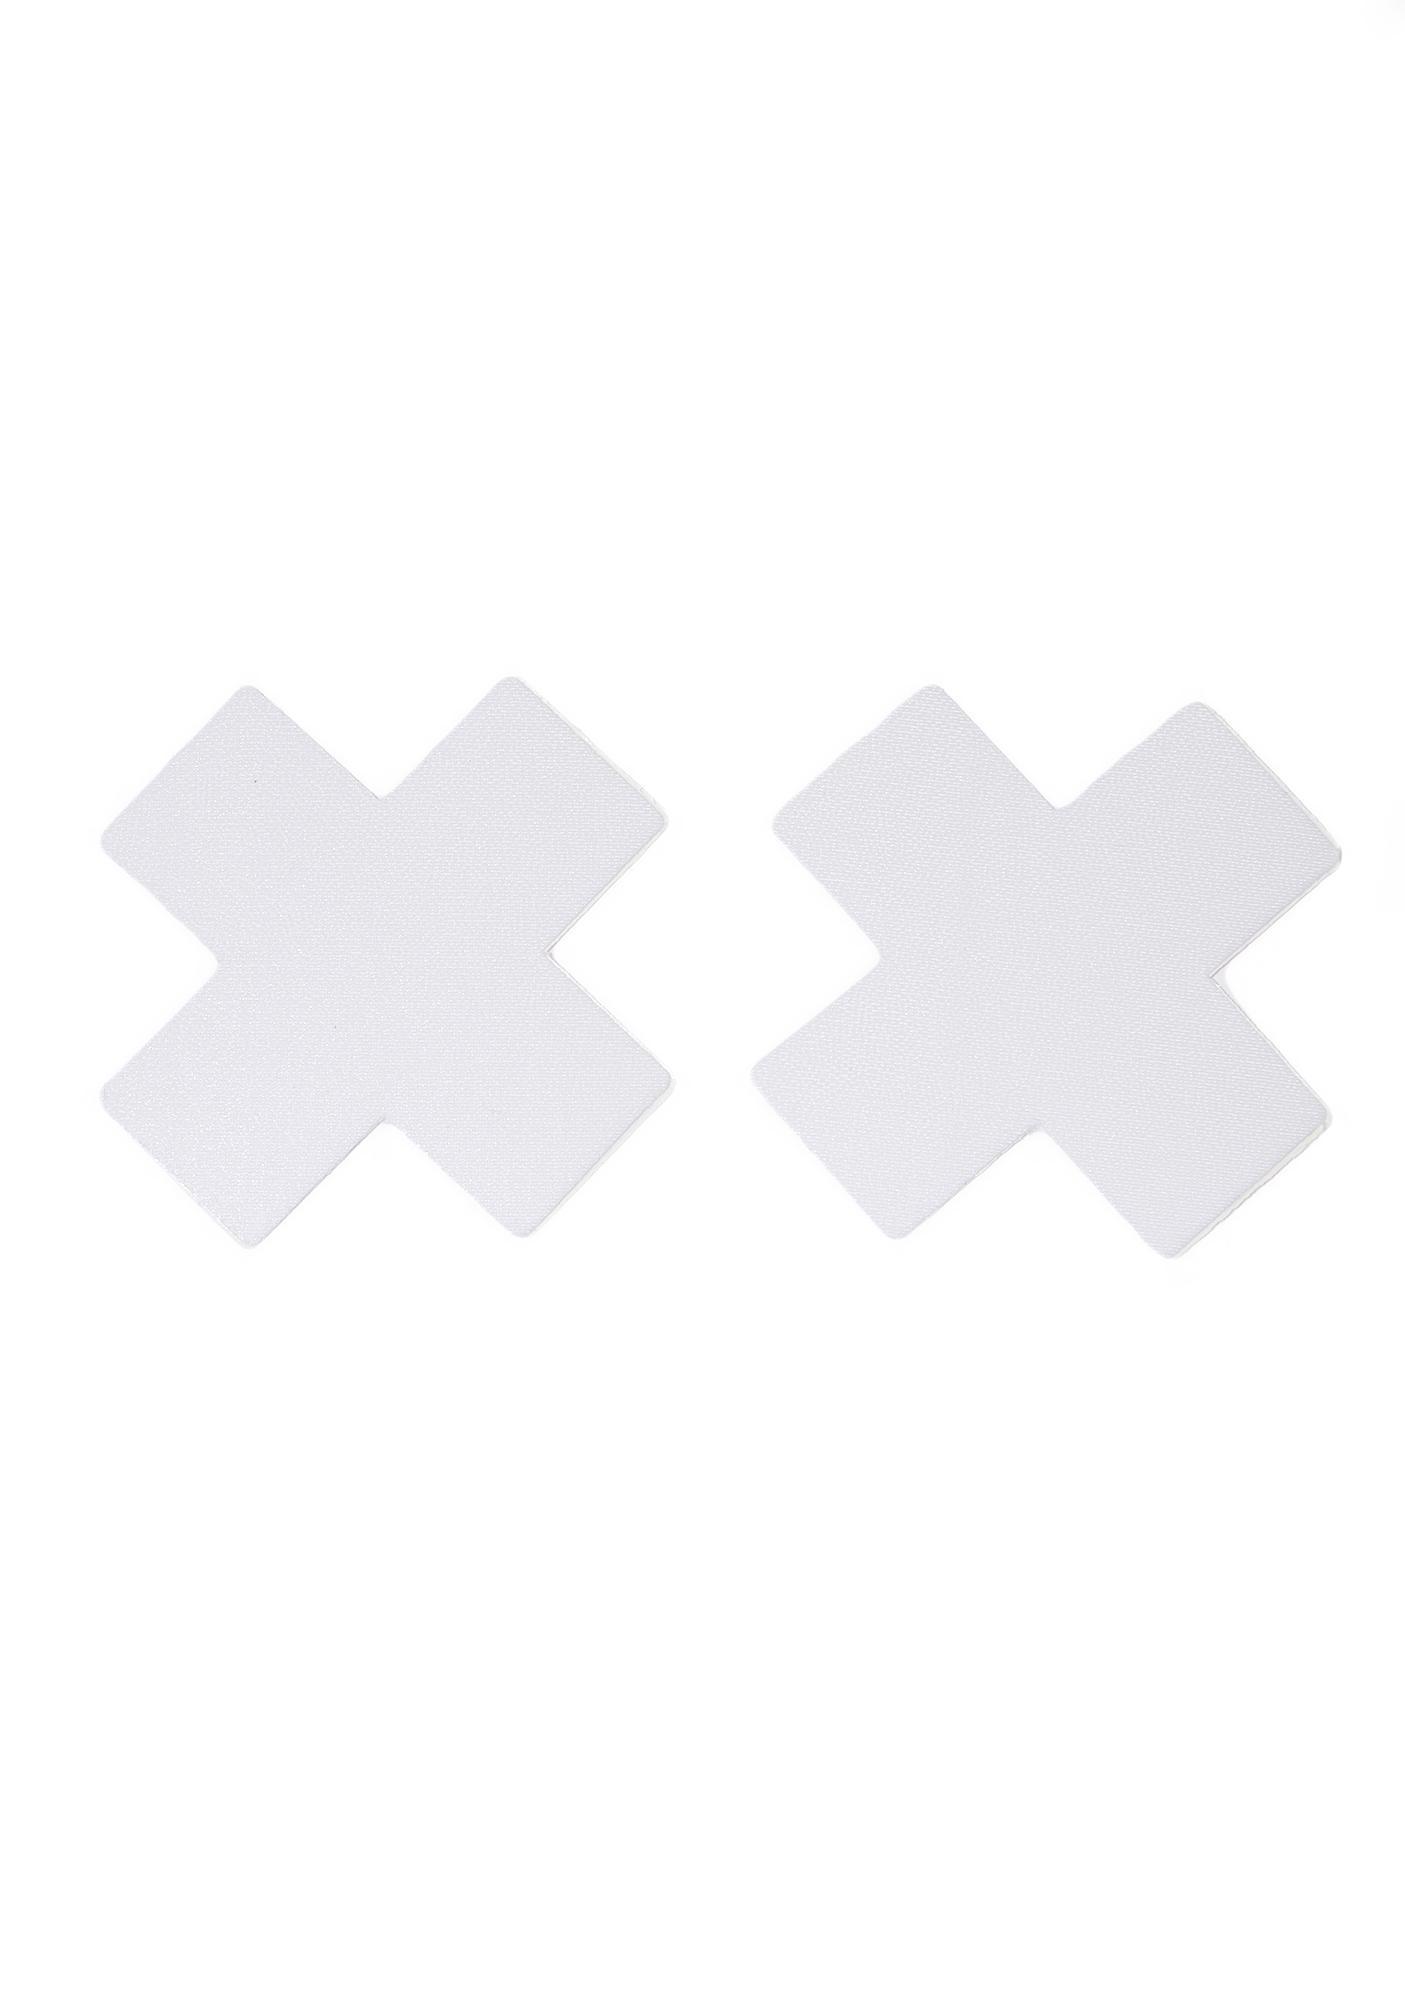 Pastease White Cross Pasties